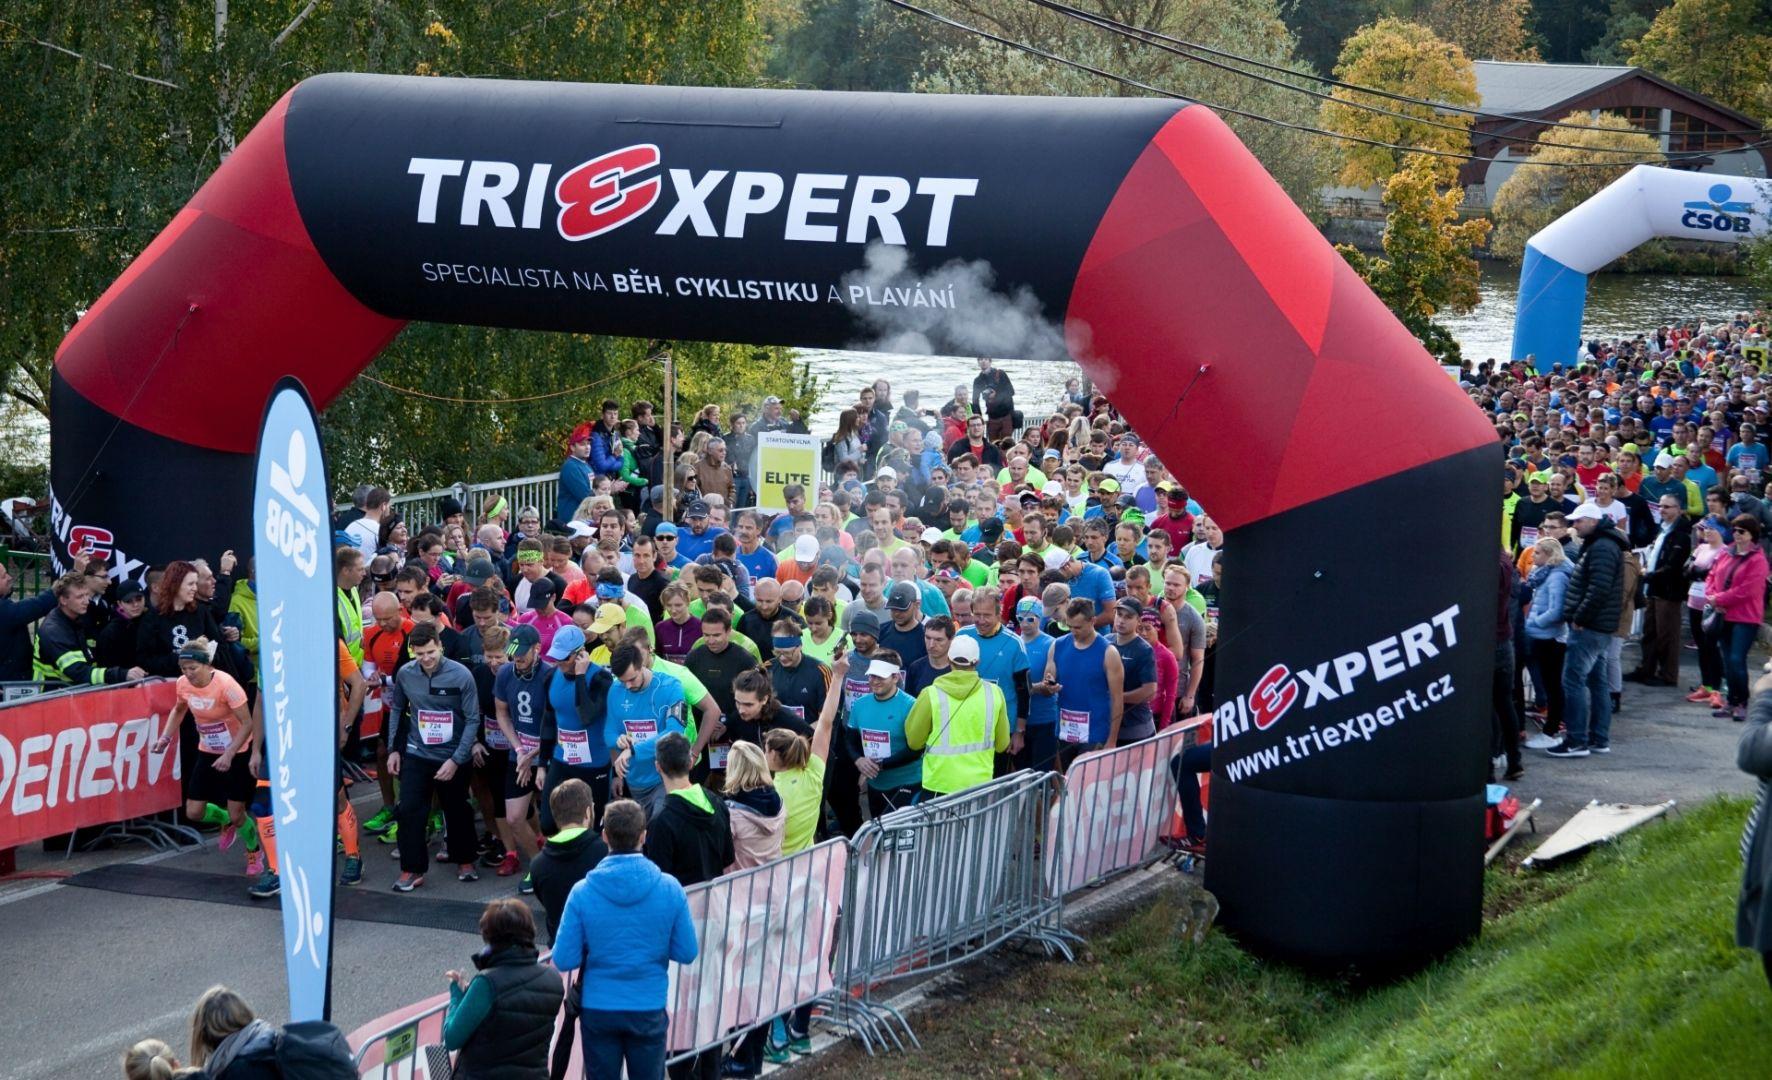 START TRIEXPERT Vokolo priglu 2017